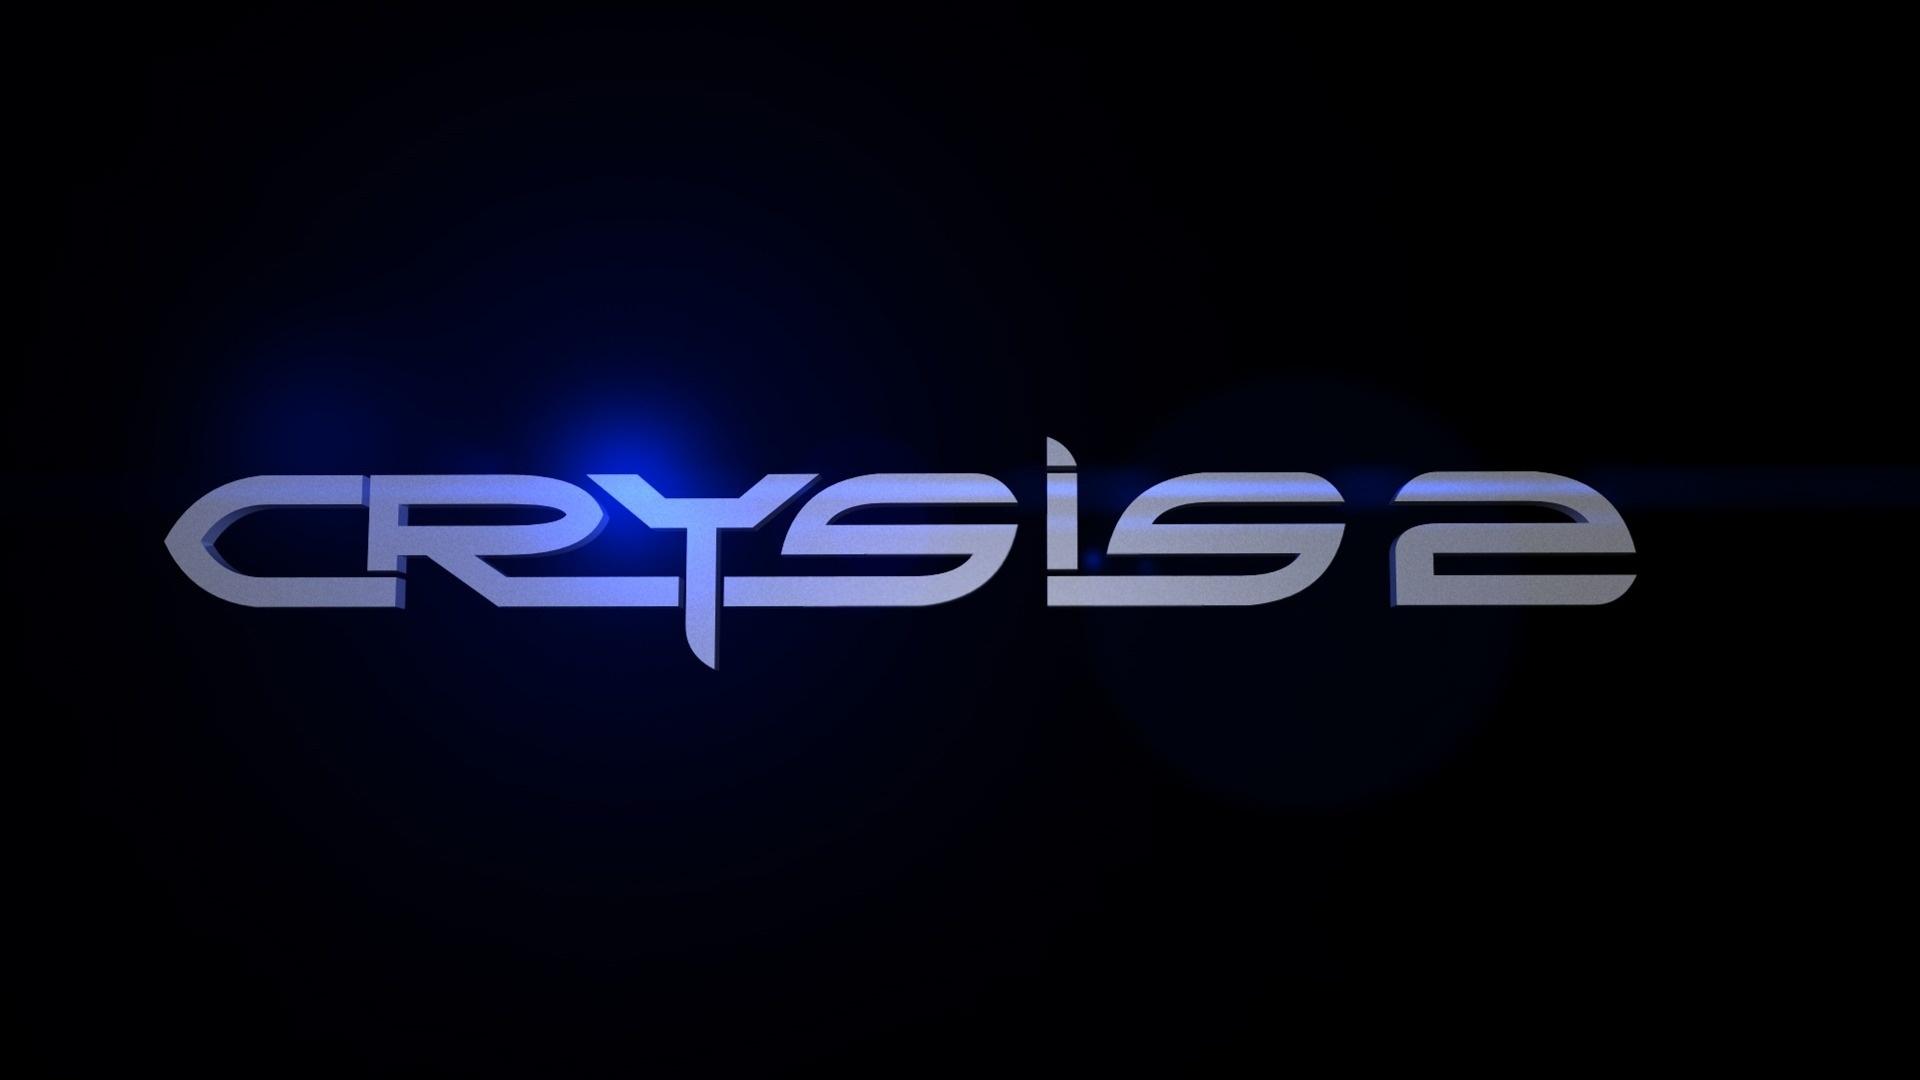 Wallpaper : Crysis 2, font, name, game, light 1920x1080